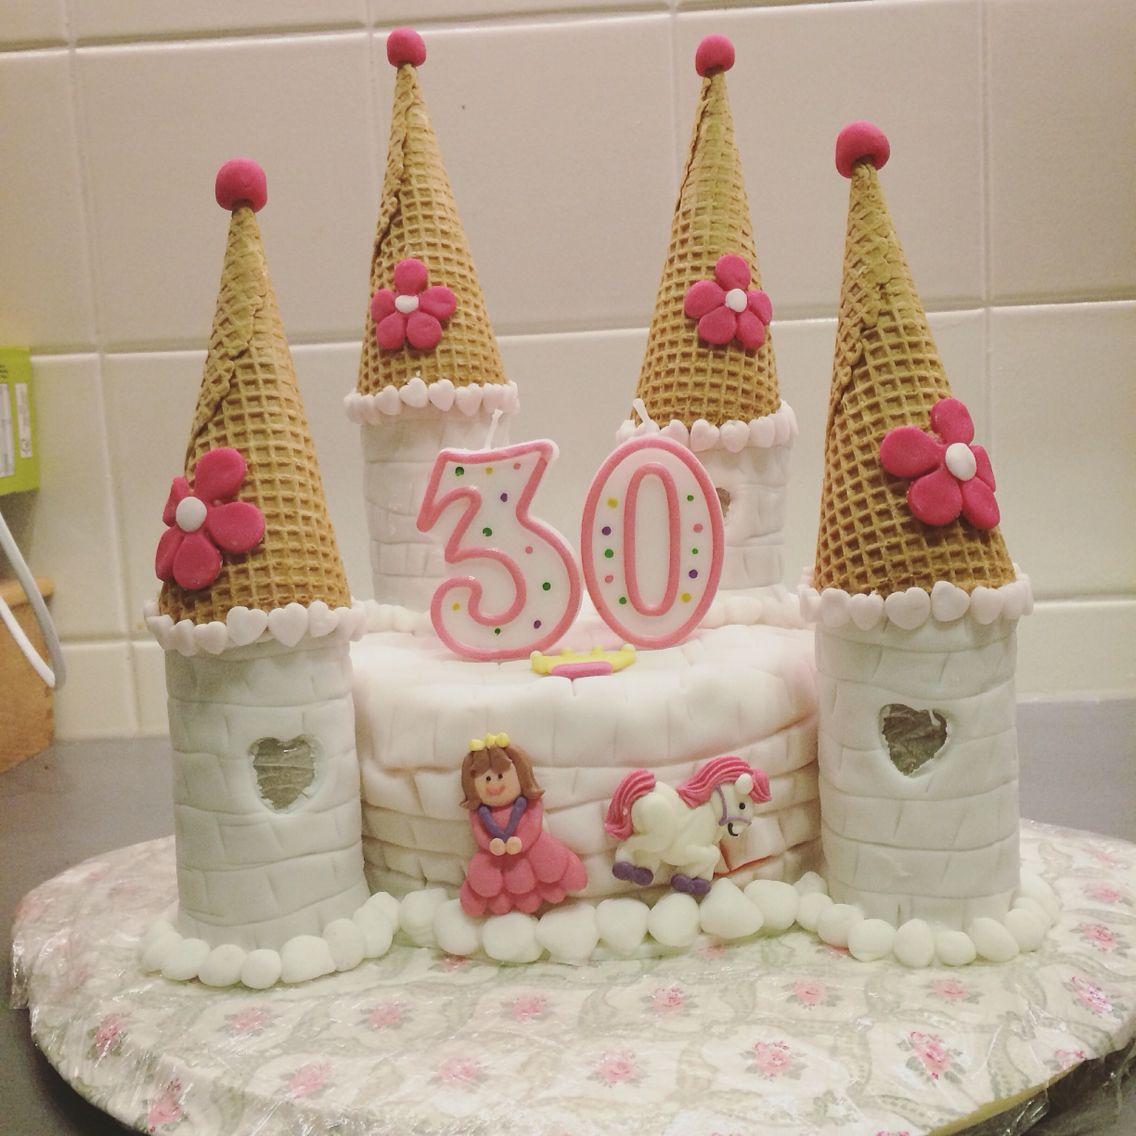 Prinzessin Schloss Torte Schloss Geburtstag Selfmade Cakes Barbie